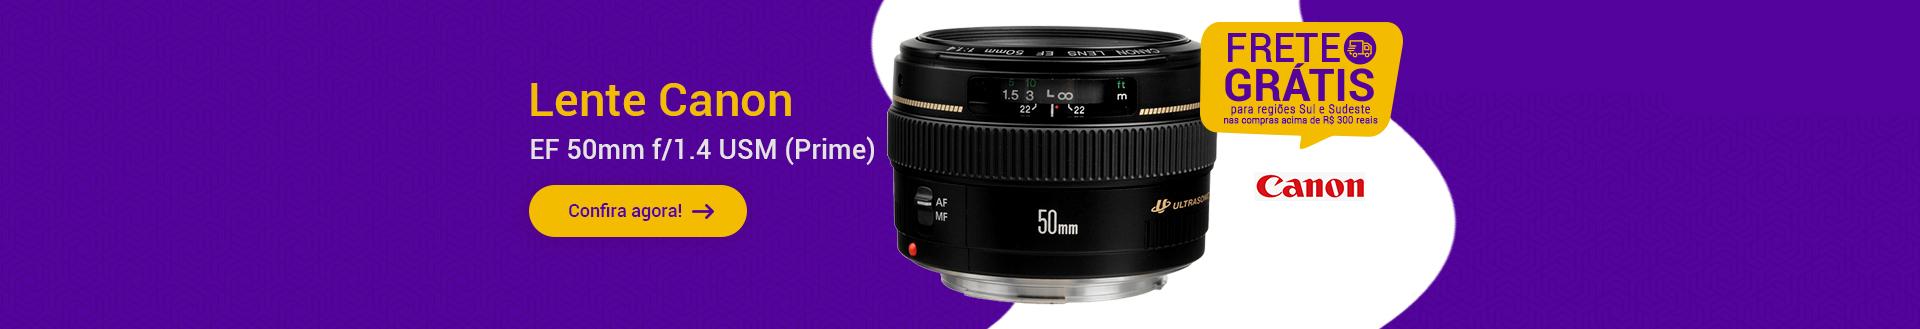 Lente Canon EF 50mm f/1.4 USM (Prime)